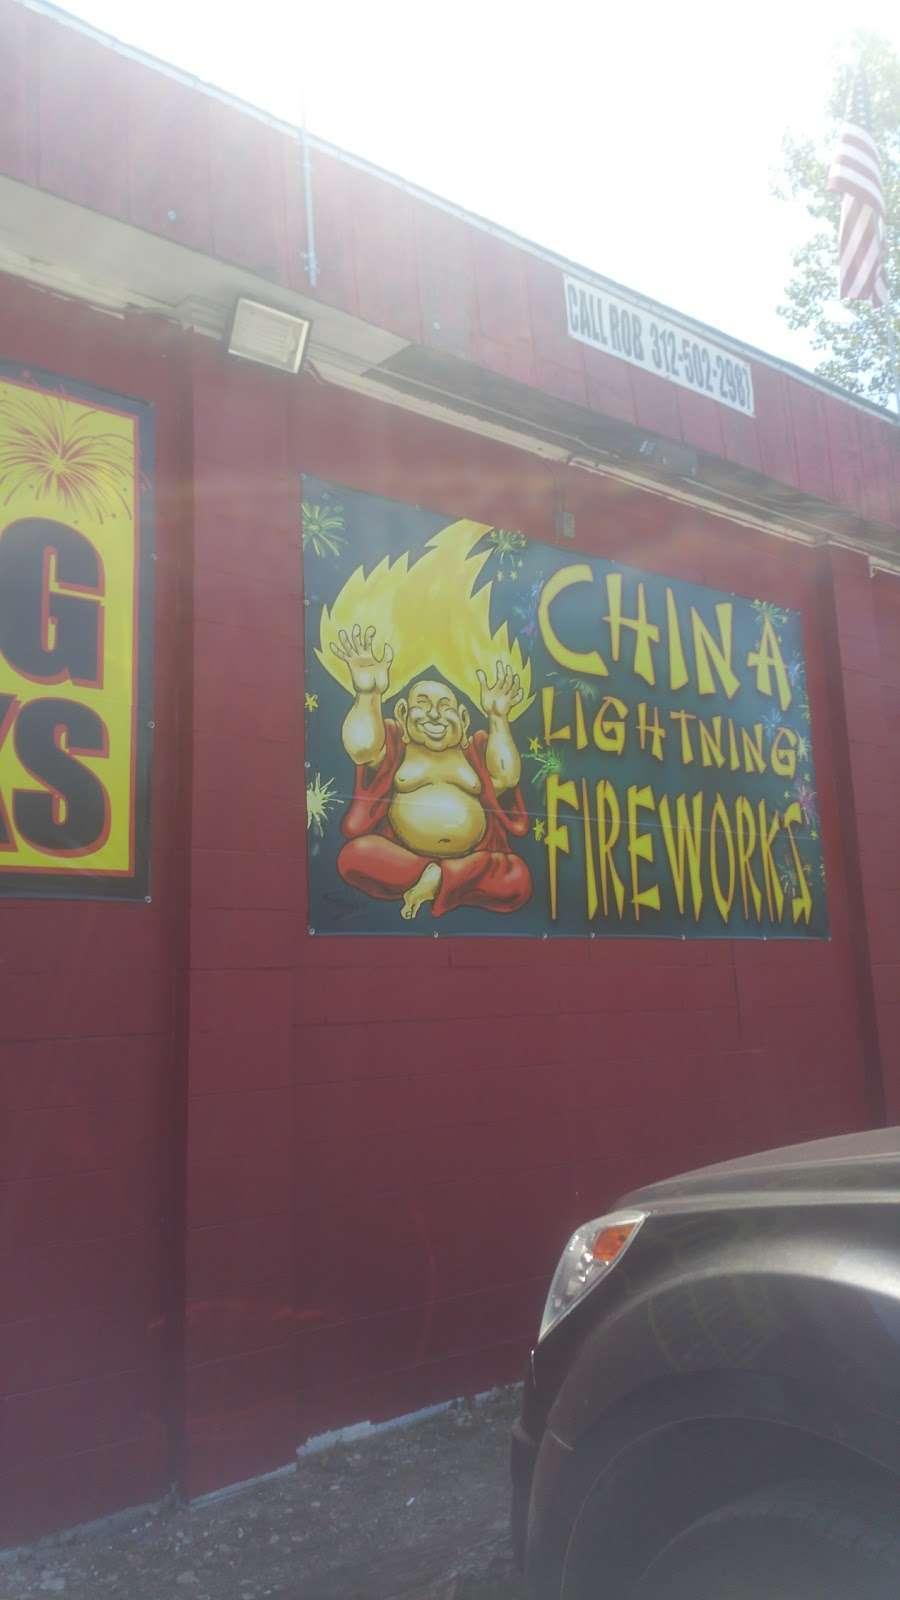 Lightning Fireworks - store    Photo 9 of 9   Address: 9401 Melton Rd, Gary, IN 46403, USA   Phone: (312) 502-2987